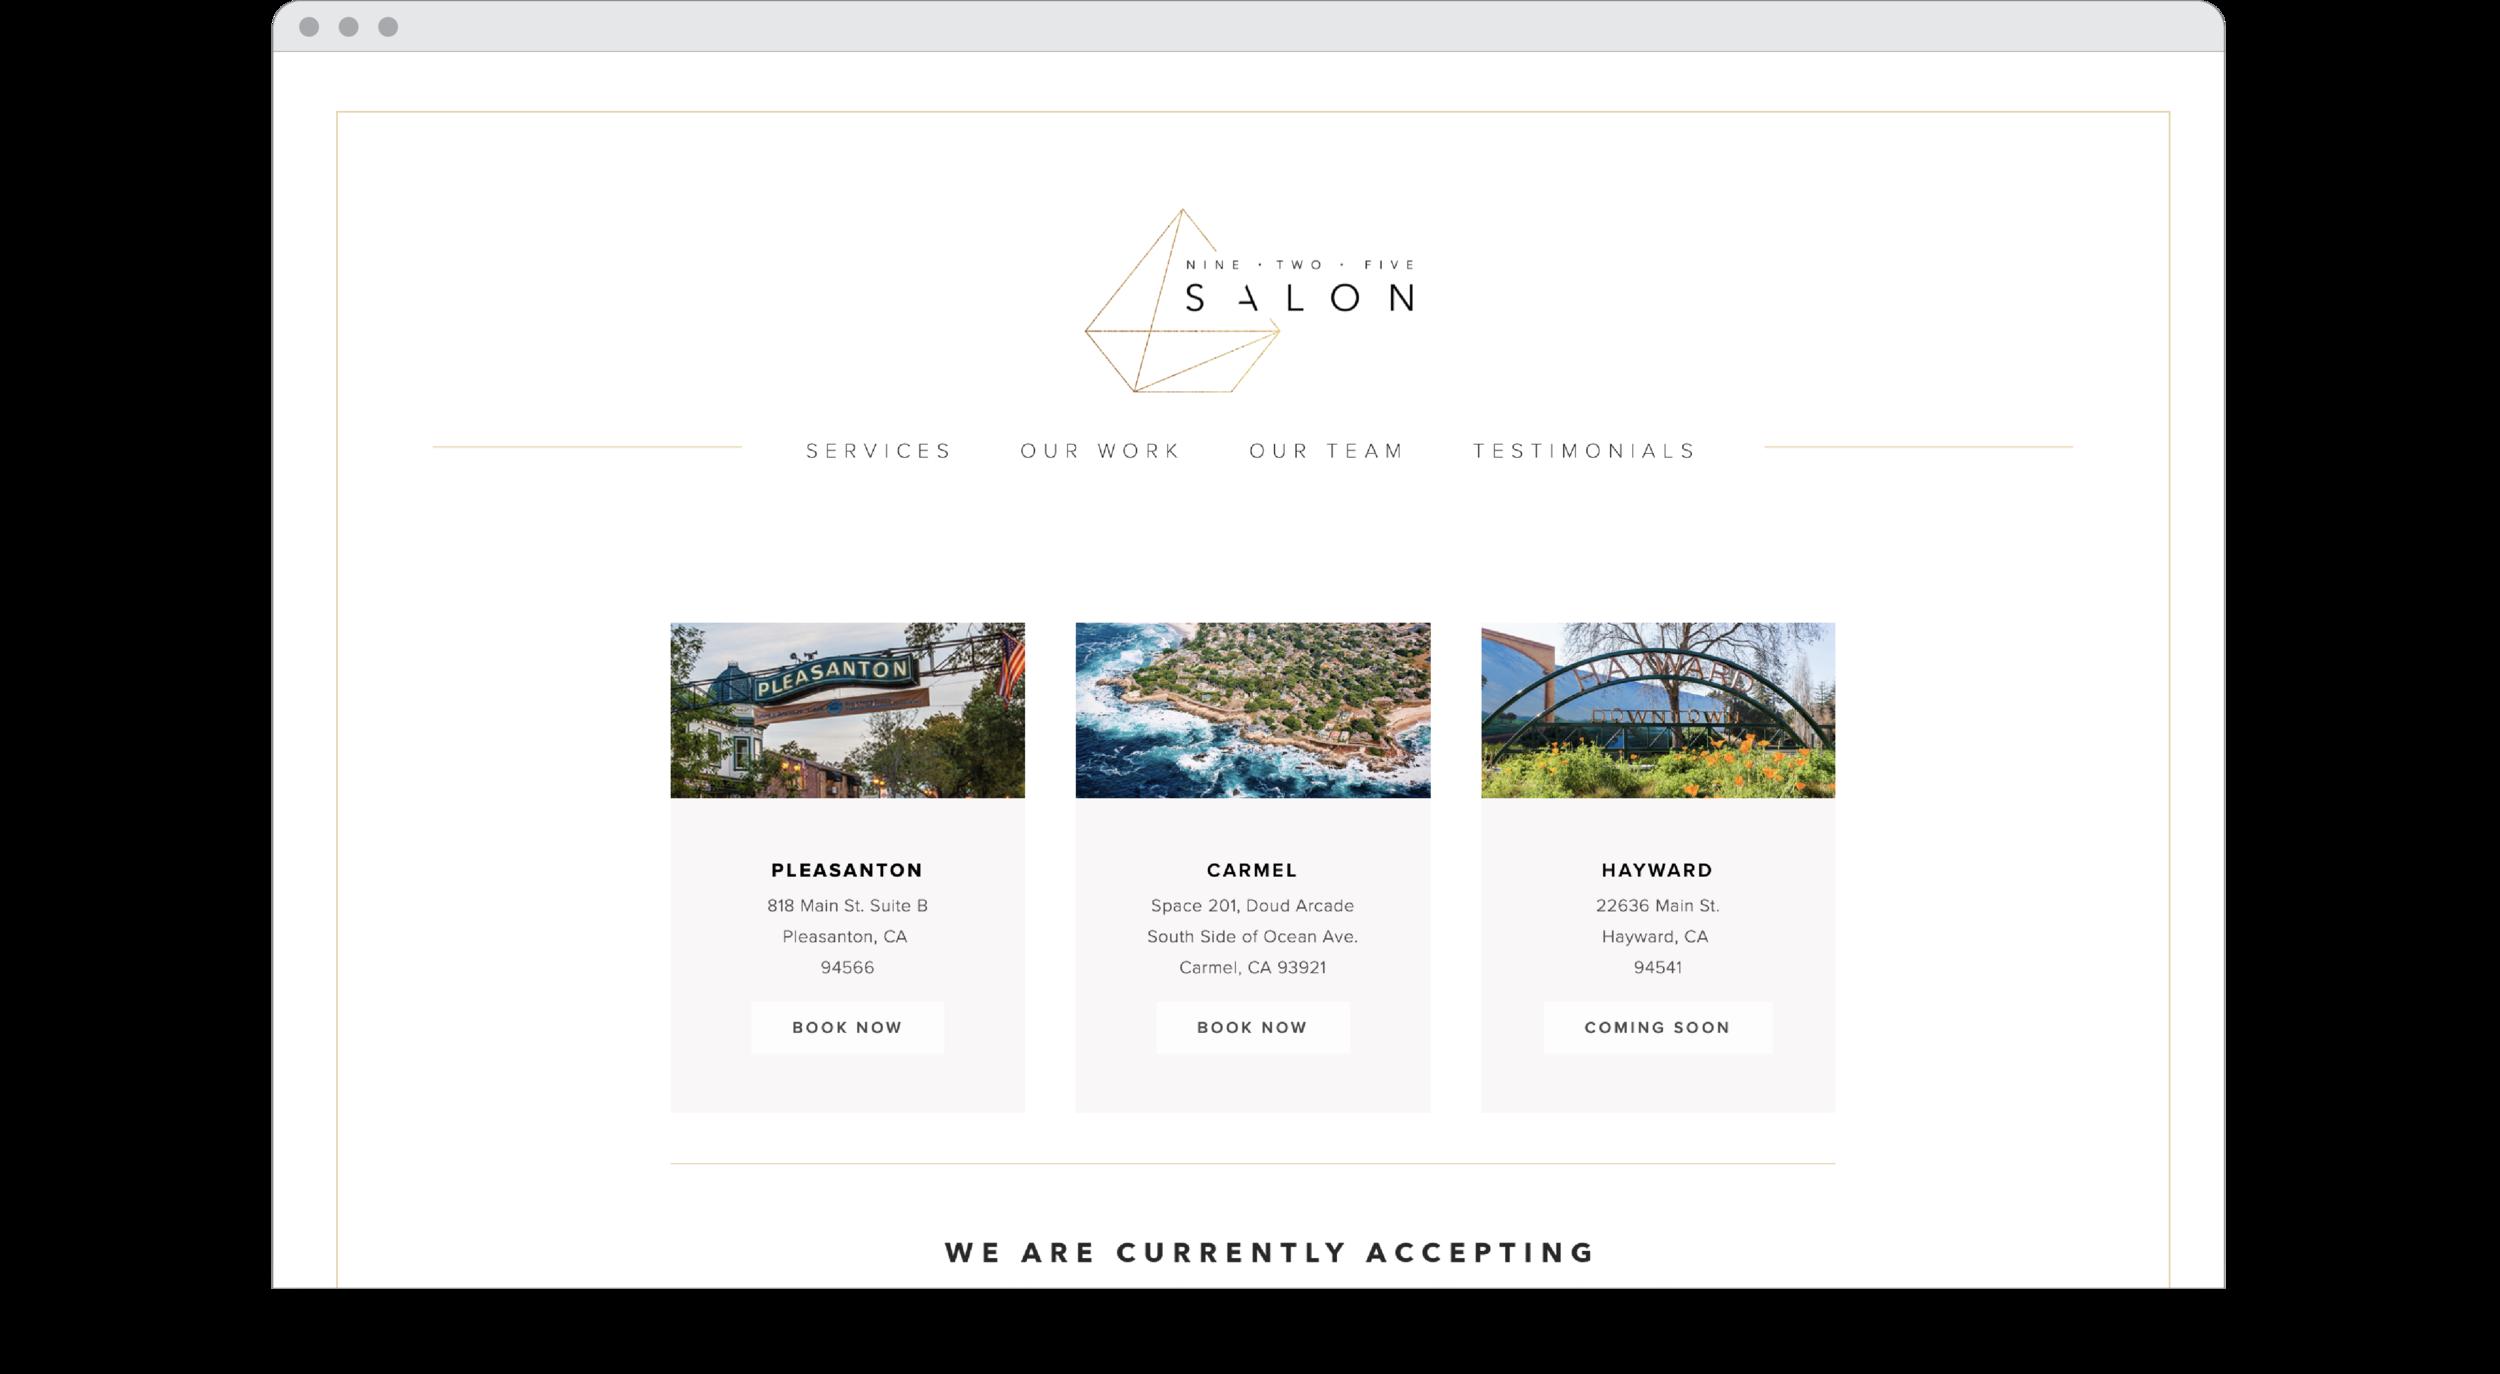 Nine Two Five Salon Web Design.png